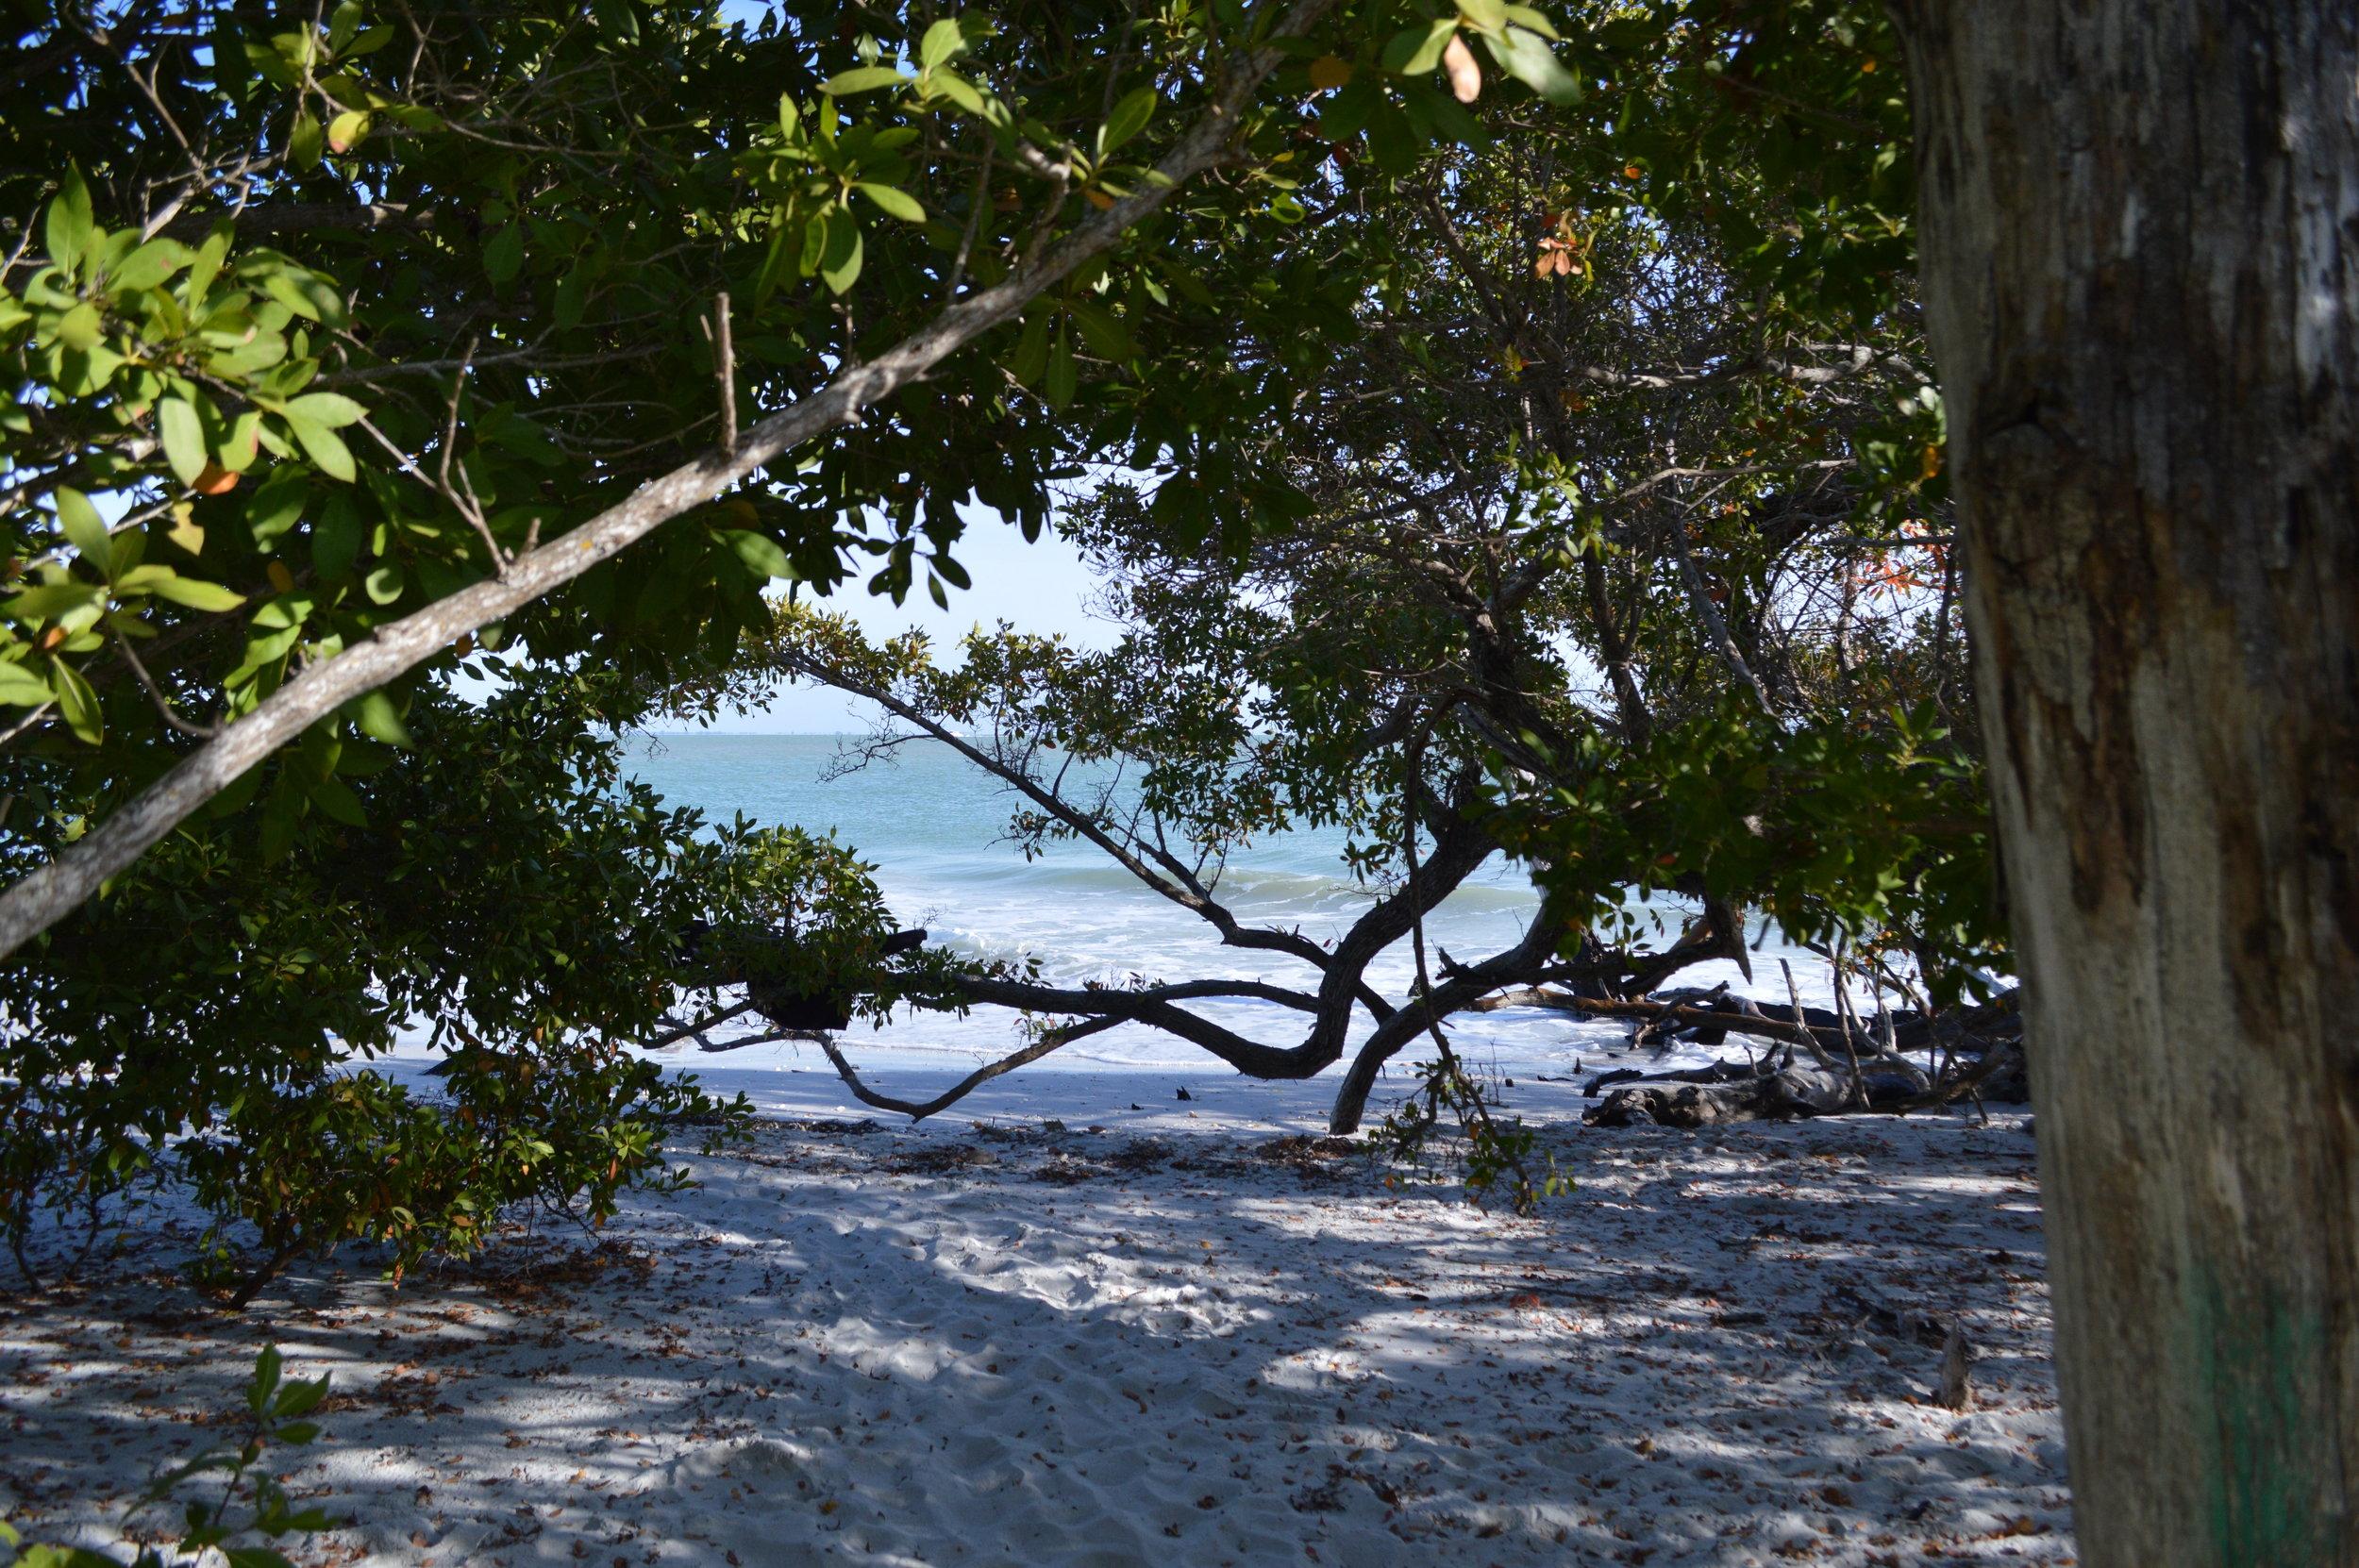 Enjoy a picnic under the mangrove canopy